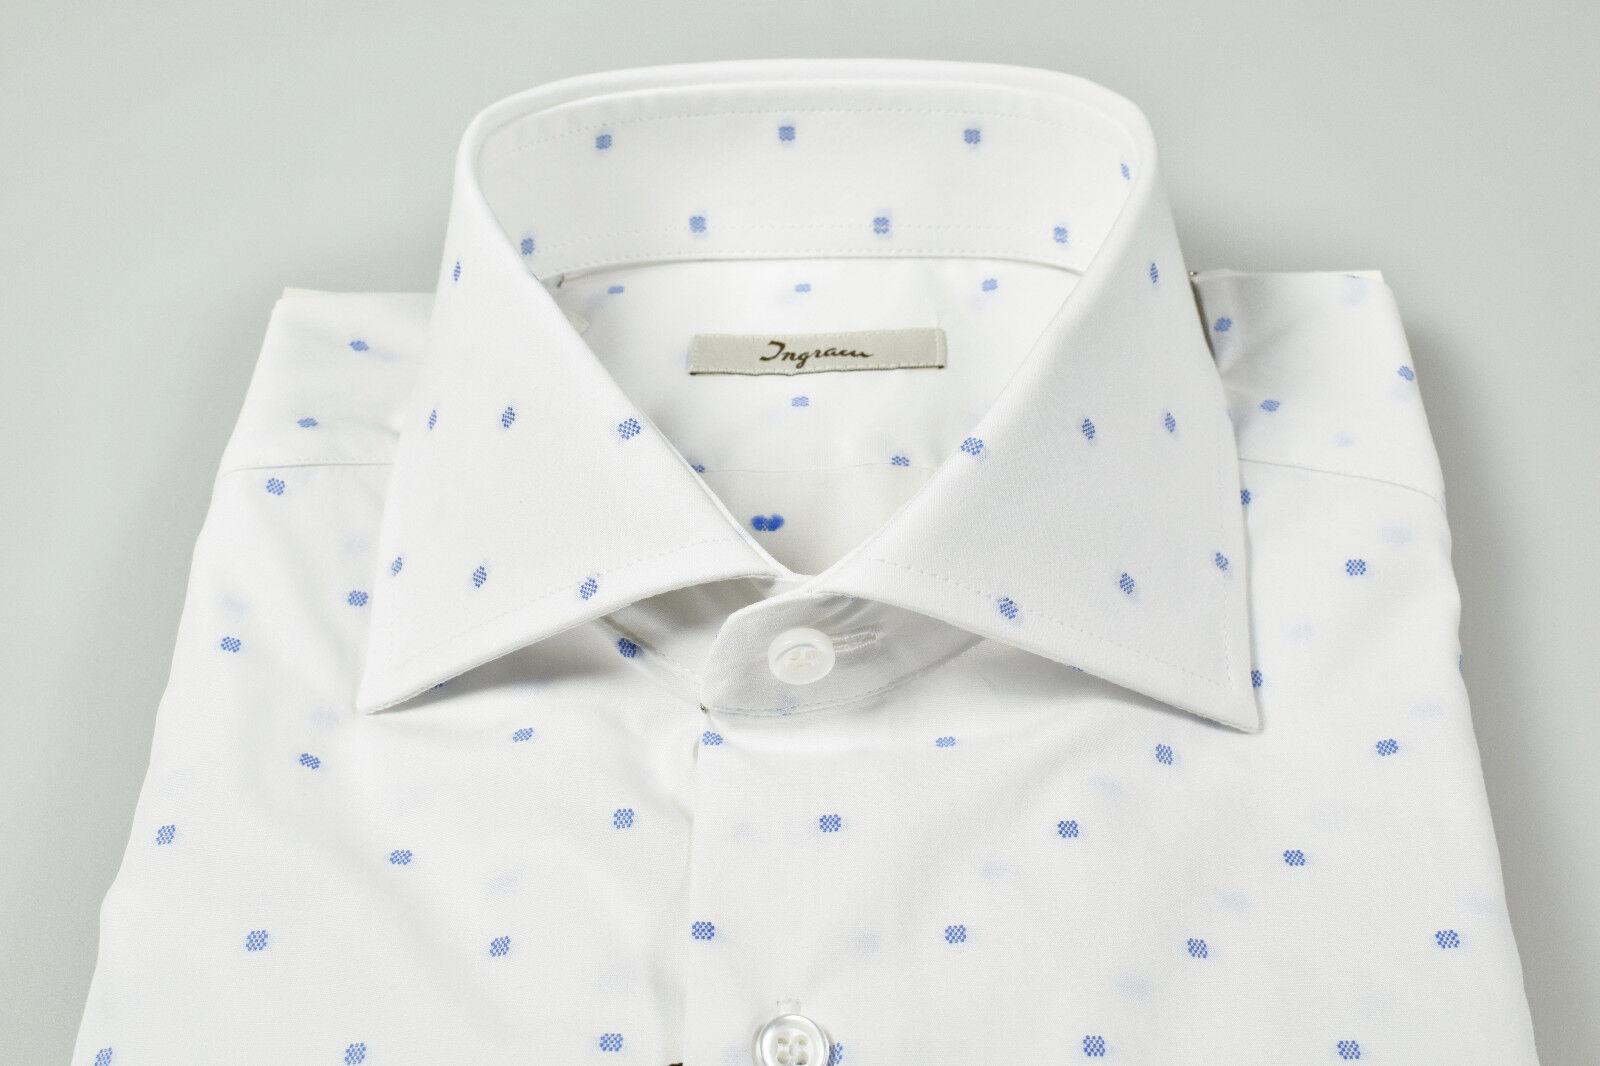 Camicia Ingram fil slim fit collo francese bianca cotone fil Ingram coupè disegno azzurro 11be0e